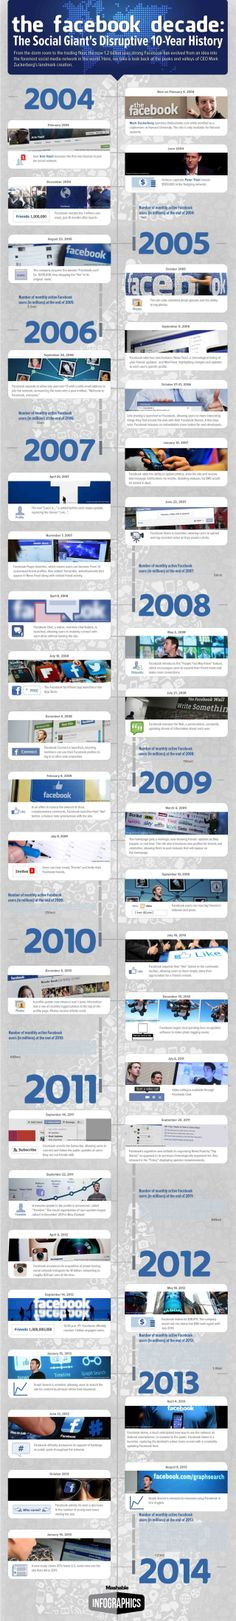 The FaceBook decade #infografia #infographic #socialmedia